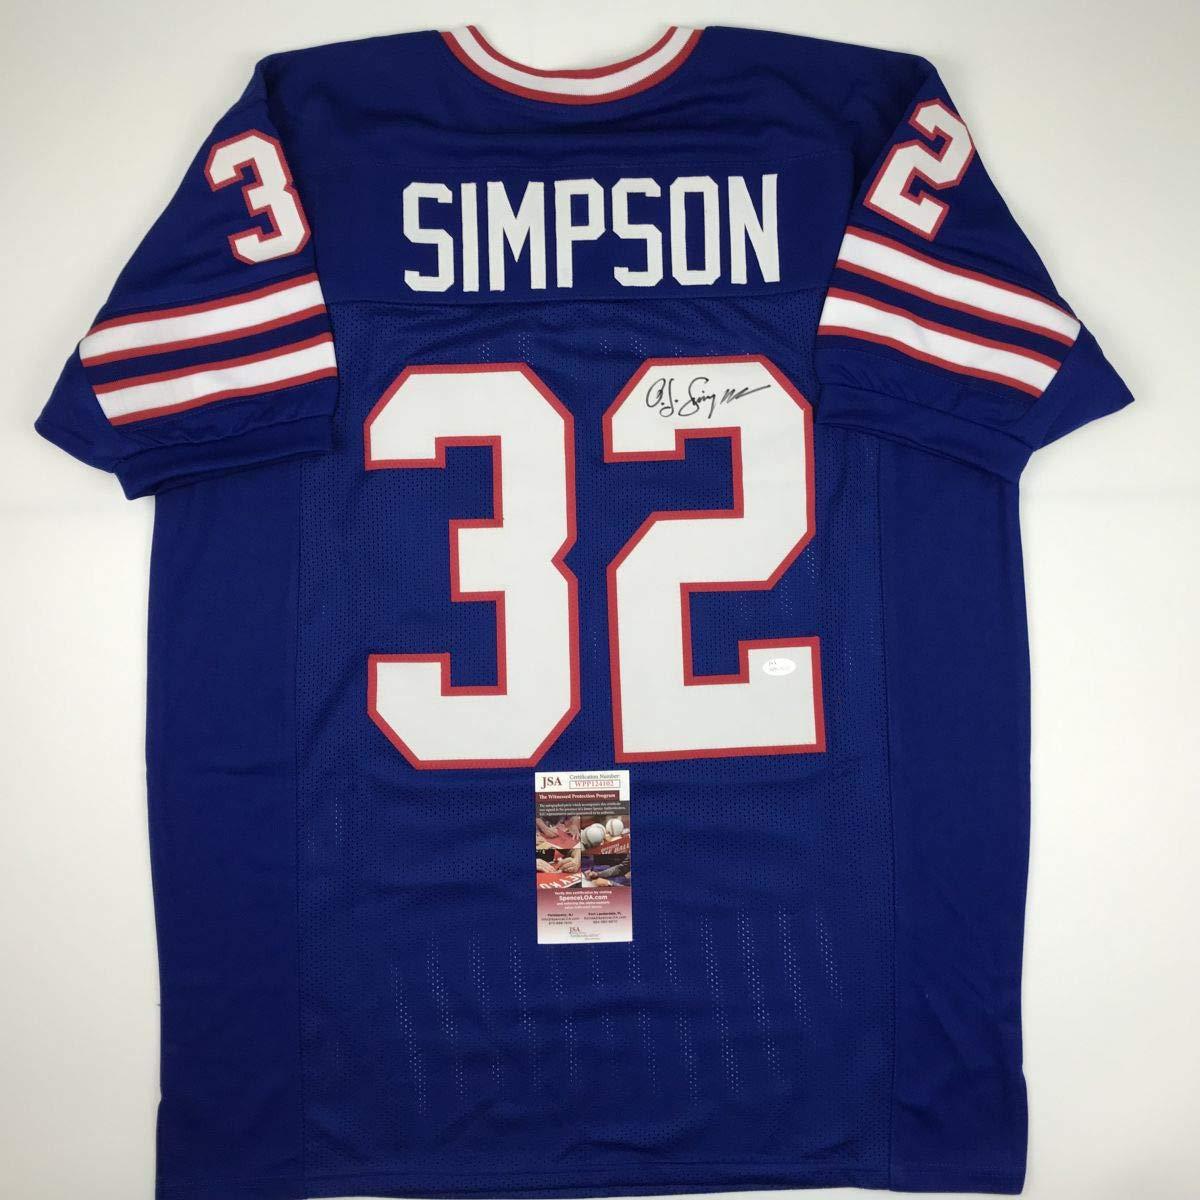 Buffalo Collectibles Amazon's Autographed Football O Oj signed At j Coa Jsa Blue Simpson Jersey Store Sports